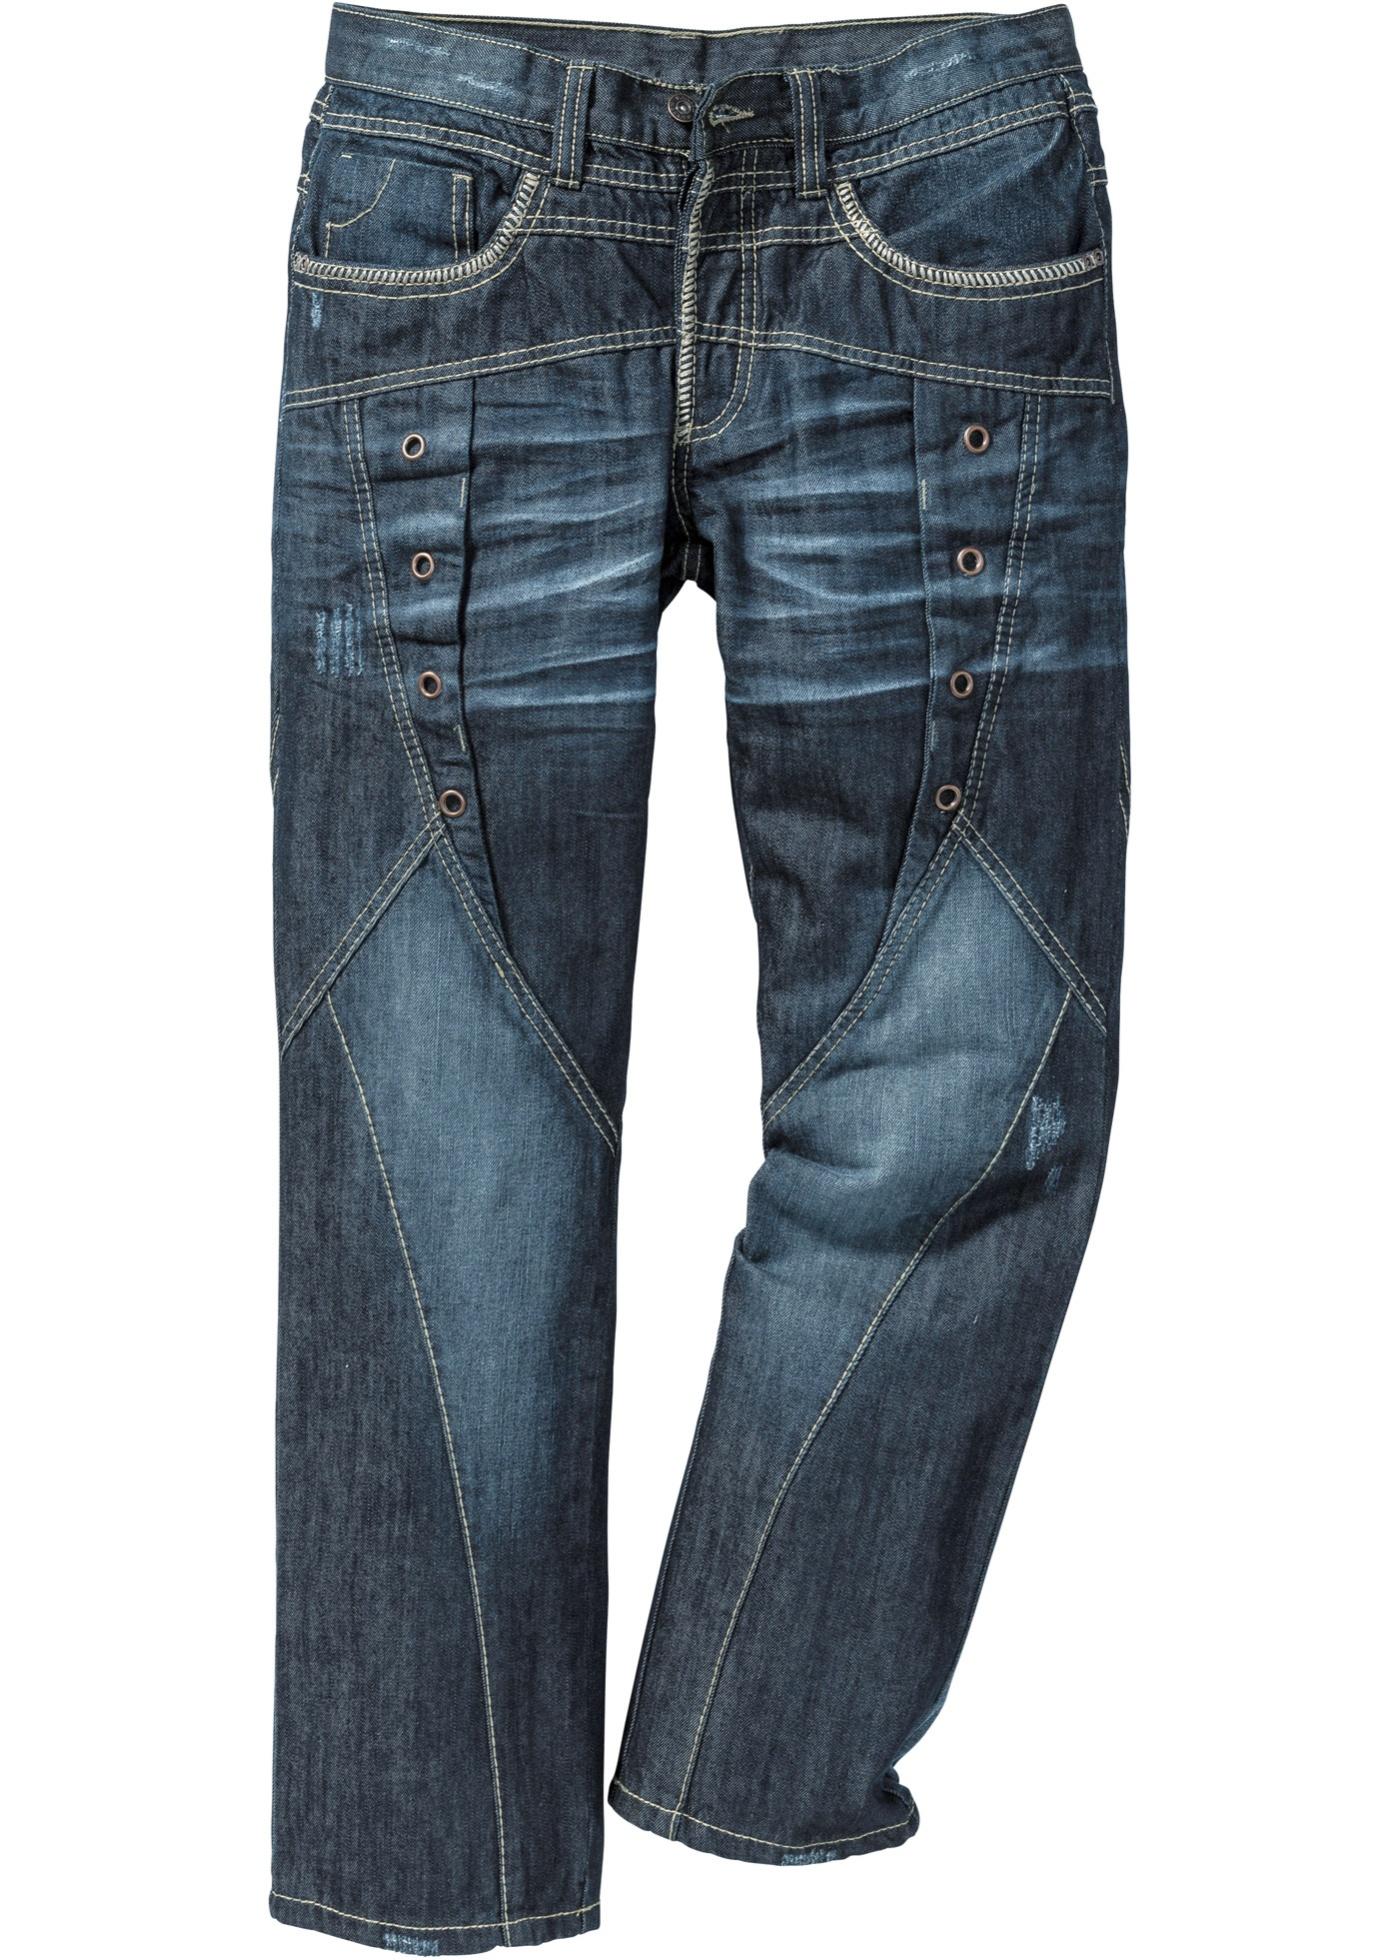 Jeans regular fit straigh